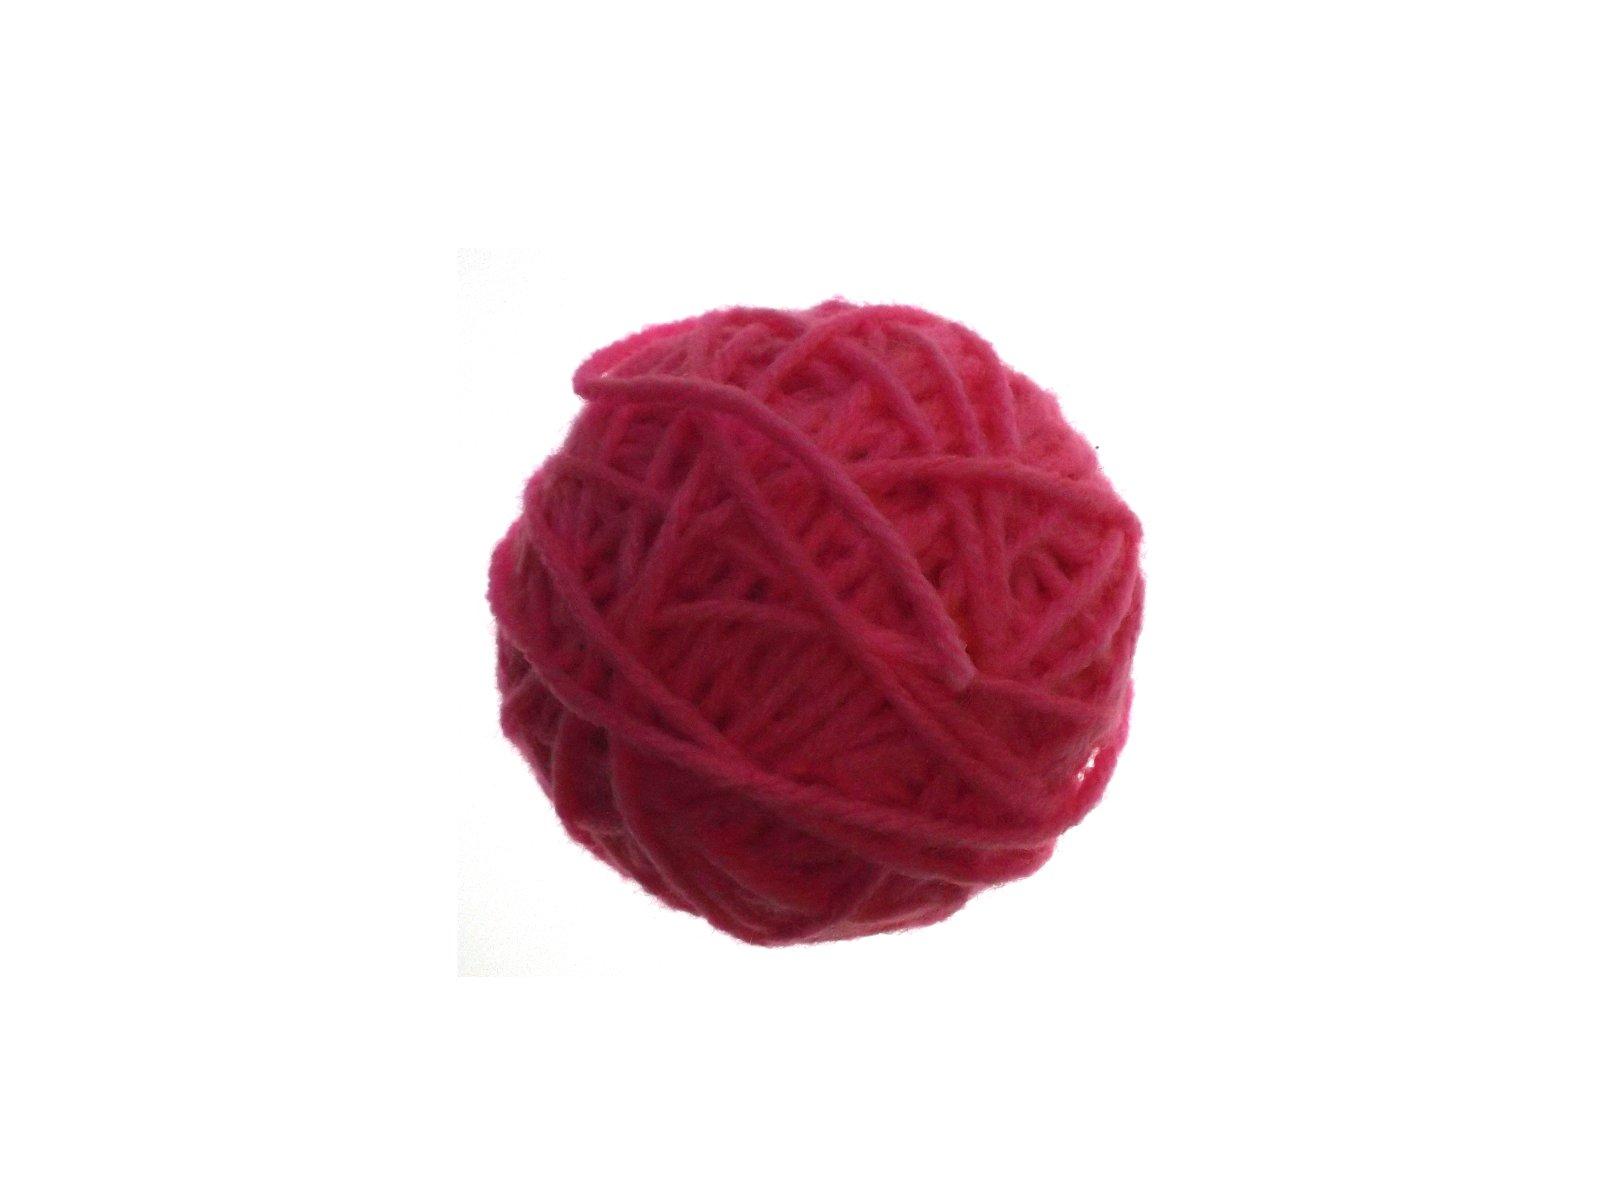 ball of yarn, Art, Sphere, Macro, Material, HQ Photo